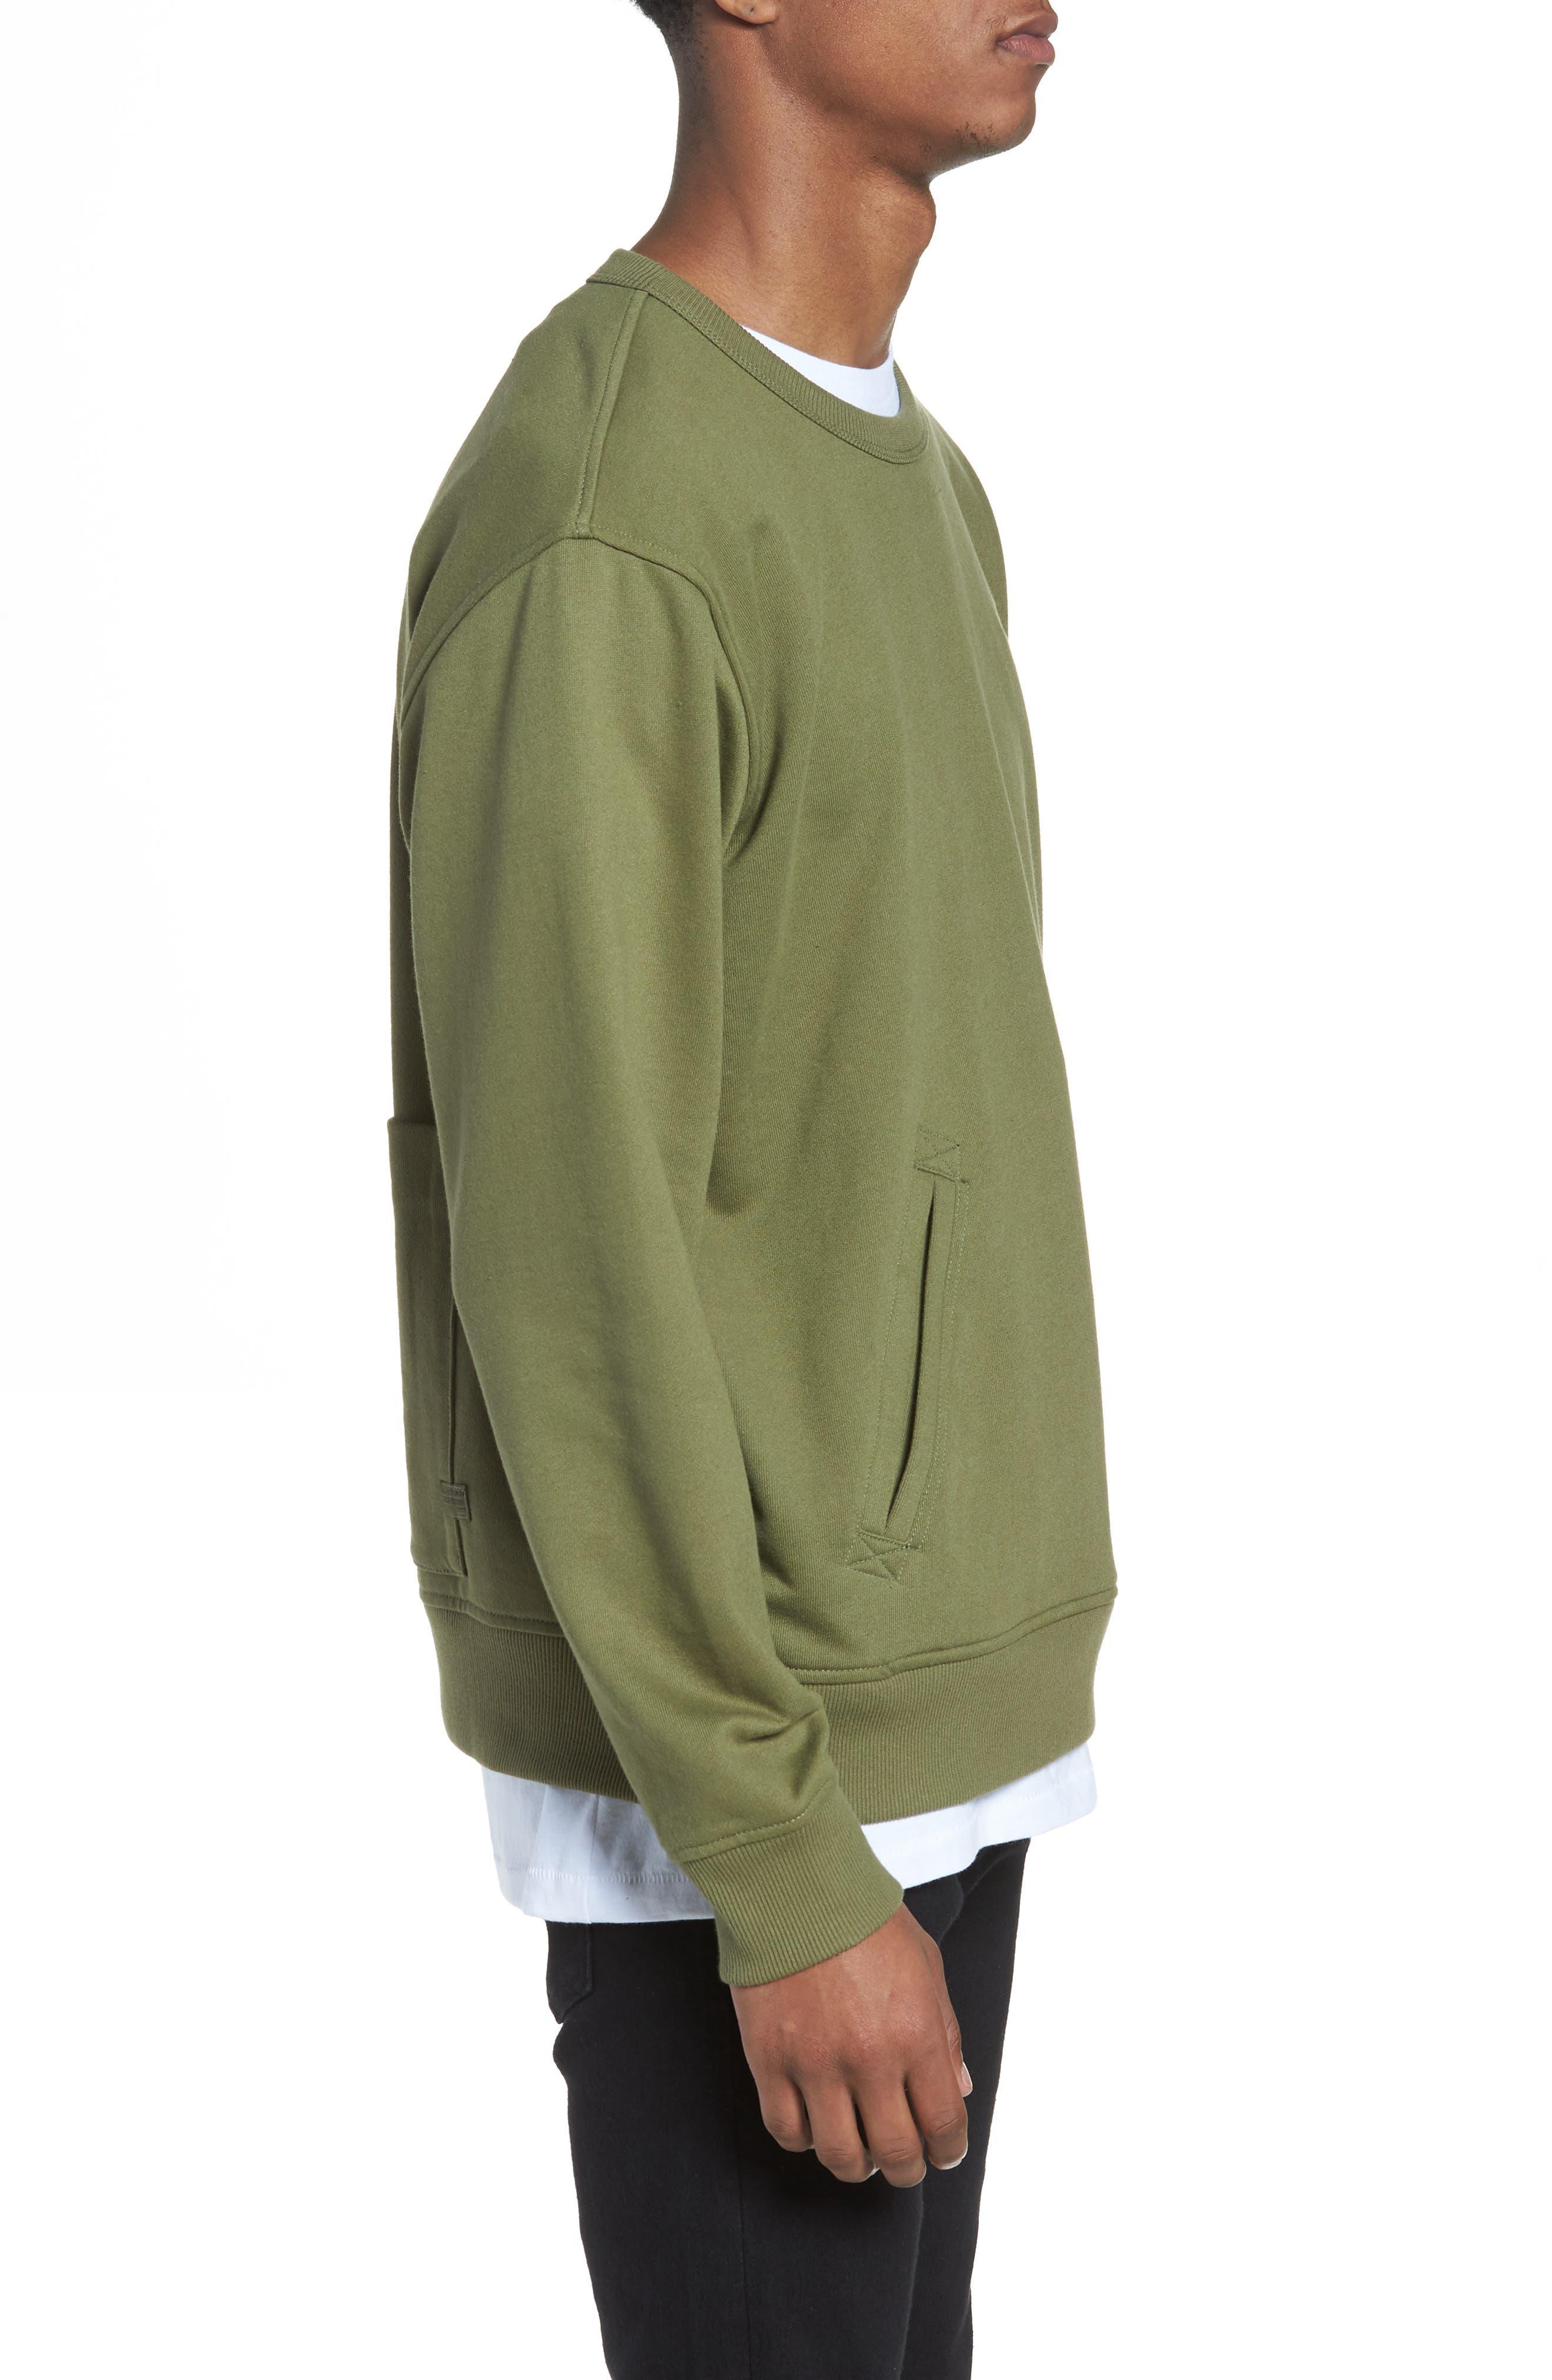 G-STAR RAW,                             Core Hybrid Archive Sweatshirt,                             Alternate thumbnail 3, color,                             300